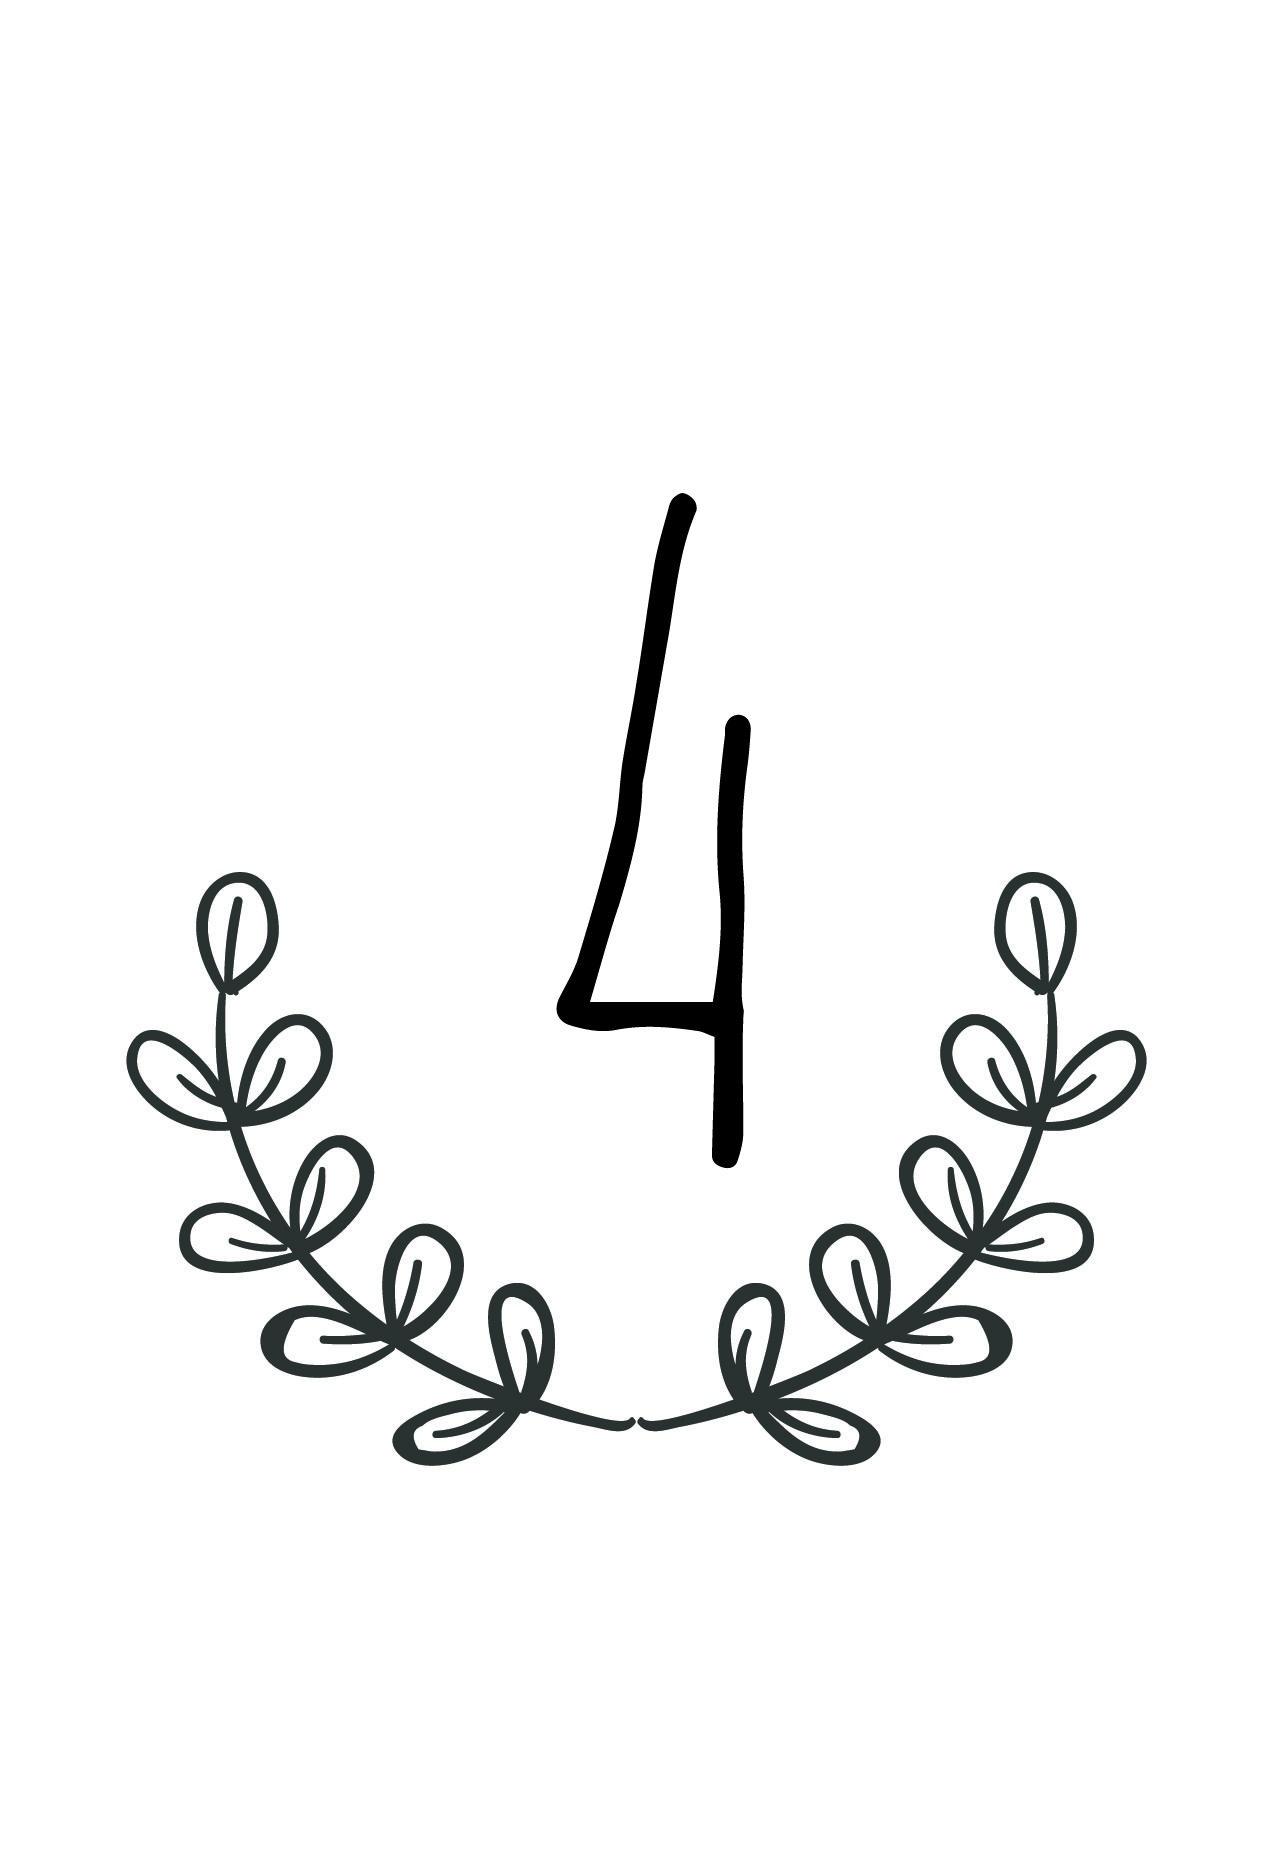 Free Rustic Wedding Table Number Printable   Future Wedding In 2019 - Free Printable Table Numbers